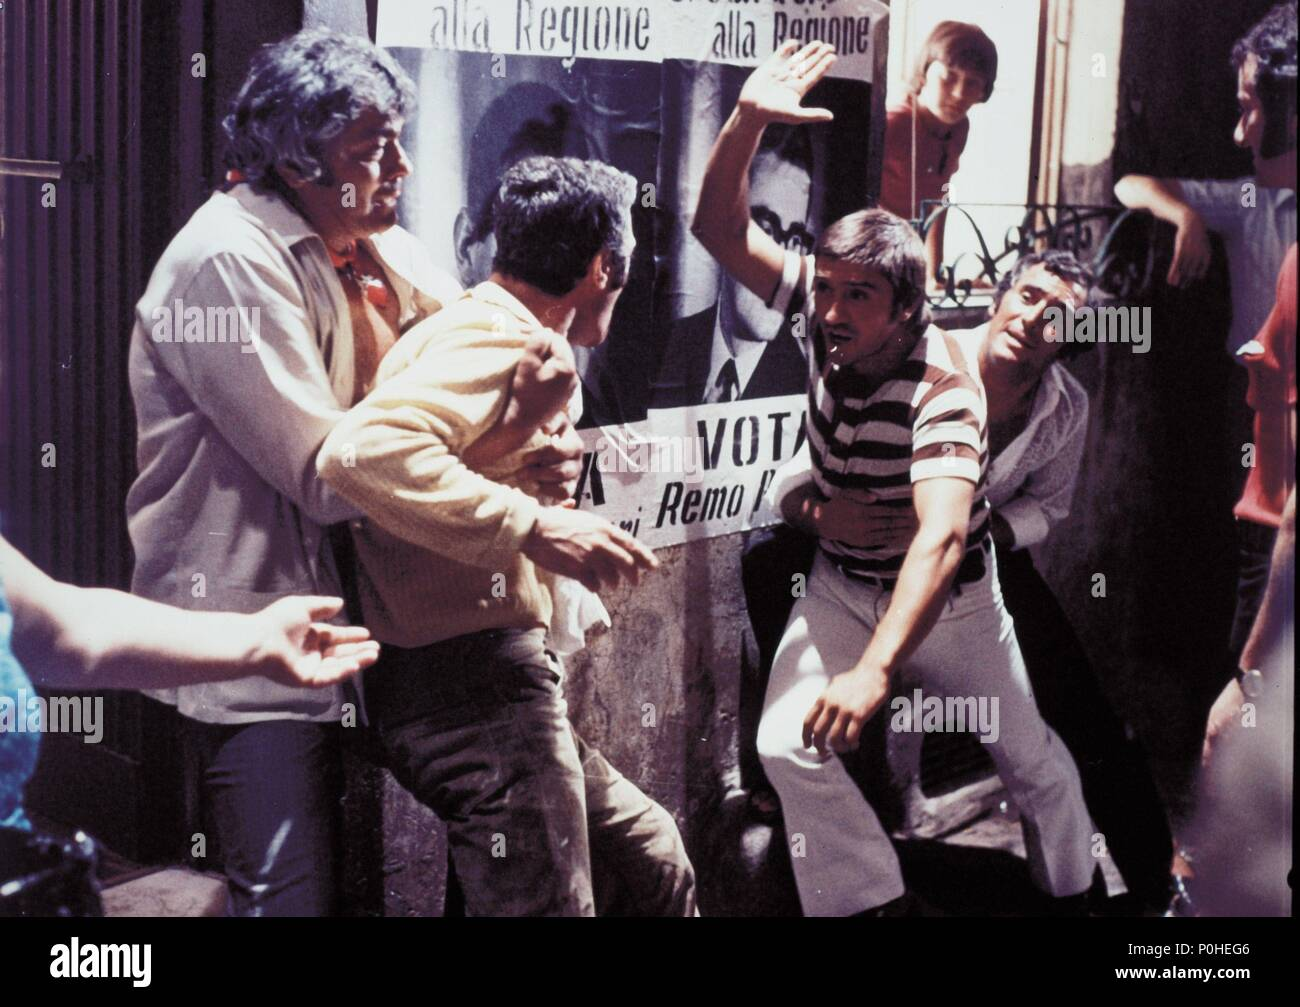 Original Film Title: ANN.  English Title: FELLINI'S ROMA.  Film Director: FEDERICO FELLINI.  Year: 1972. Credit: ULTRA FILMS/PRODS ARTISTES ASSOCIES / Album - Stock Image